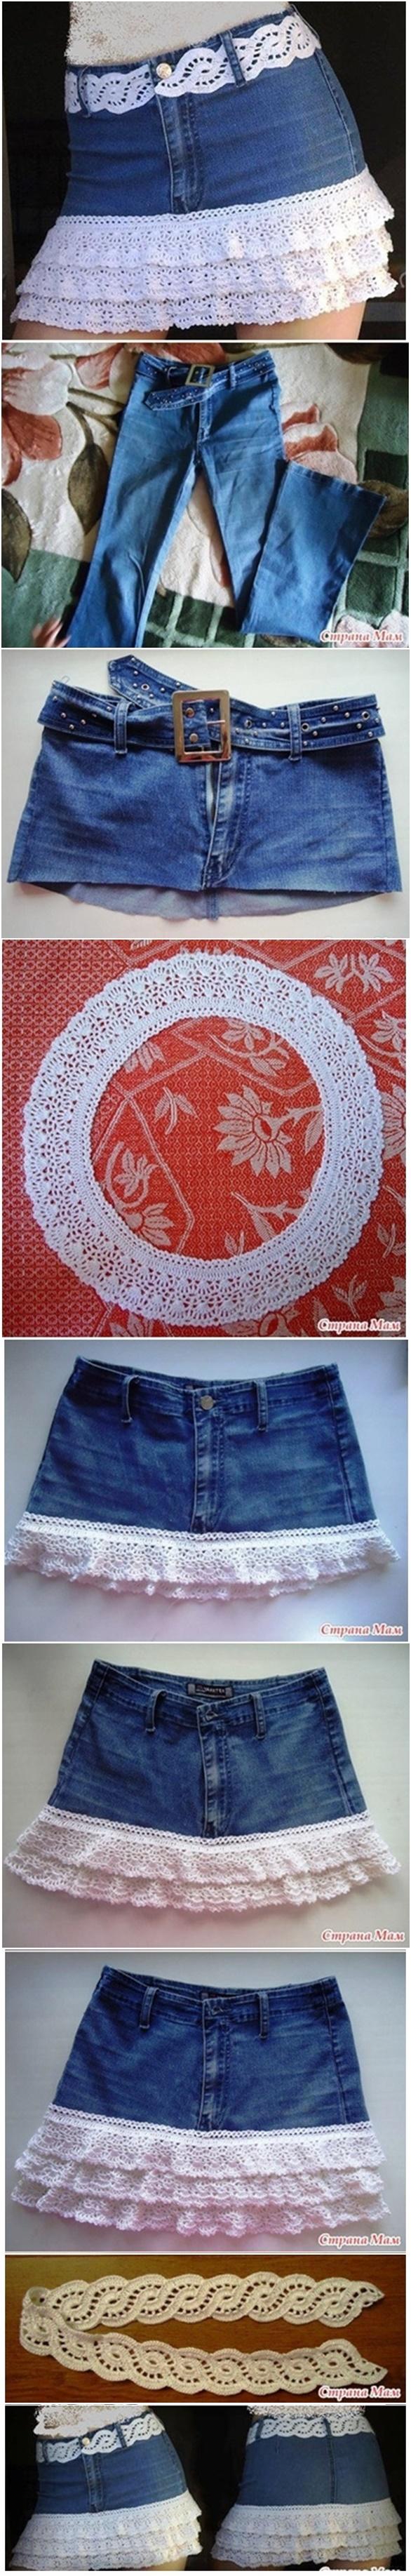 DIY Recicla Tus Pantalones